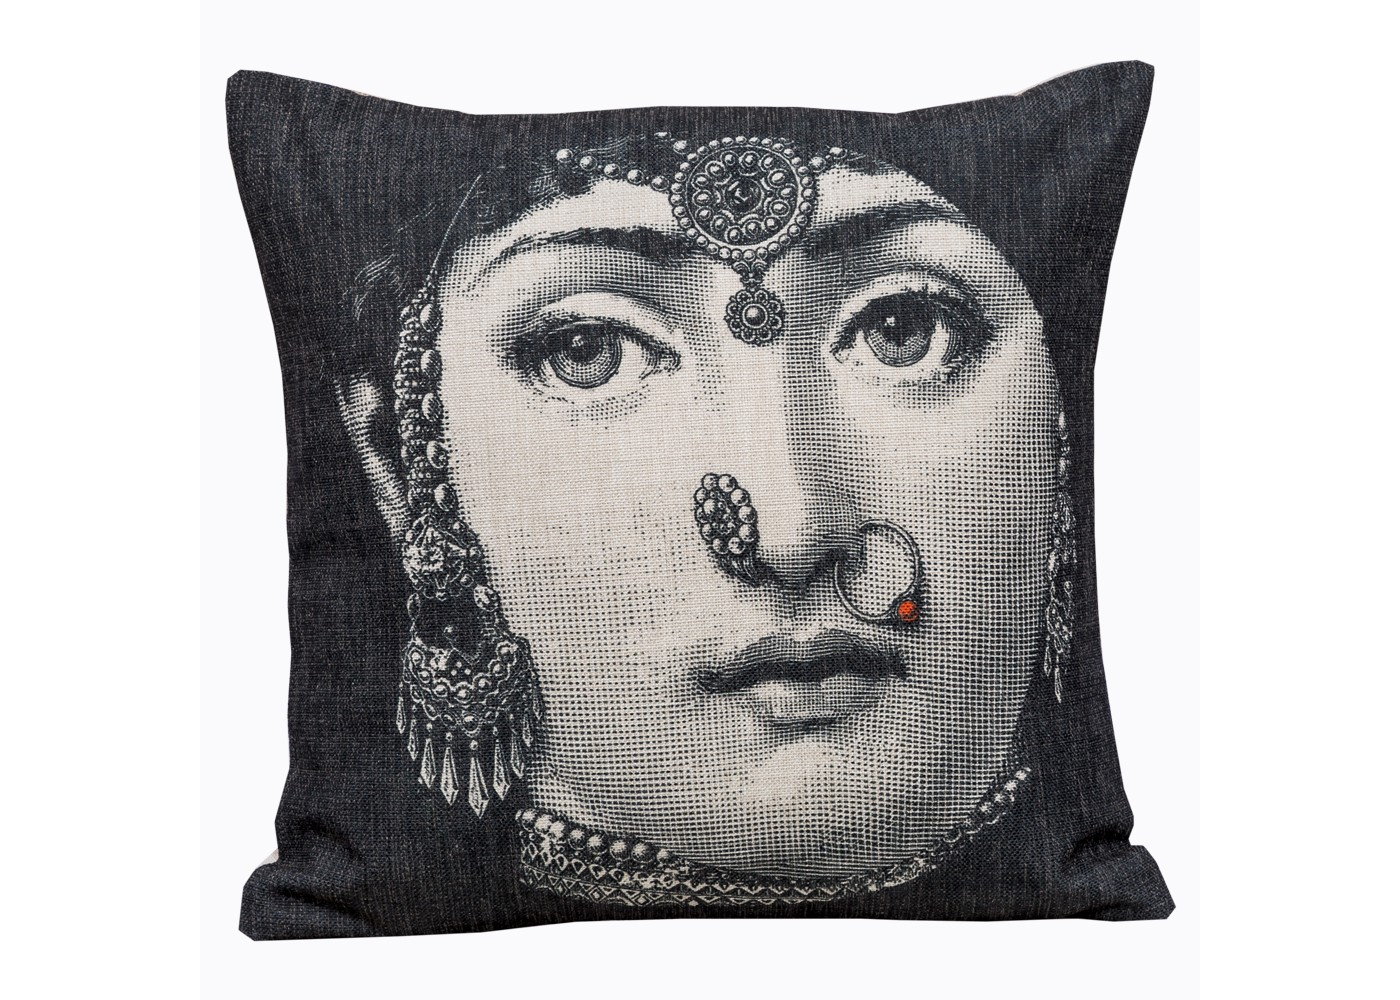 Арт-подушка лина , версия индия (object desire) черный 45.0x15.0x15 см. фото